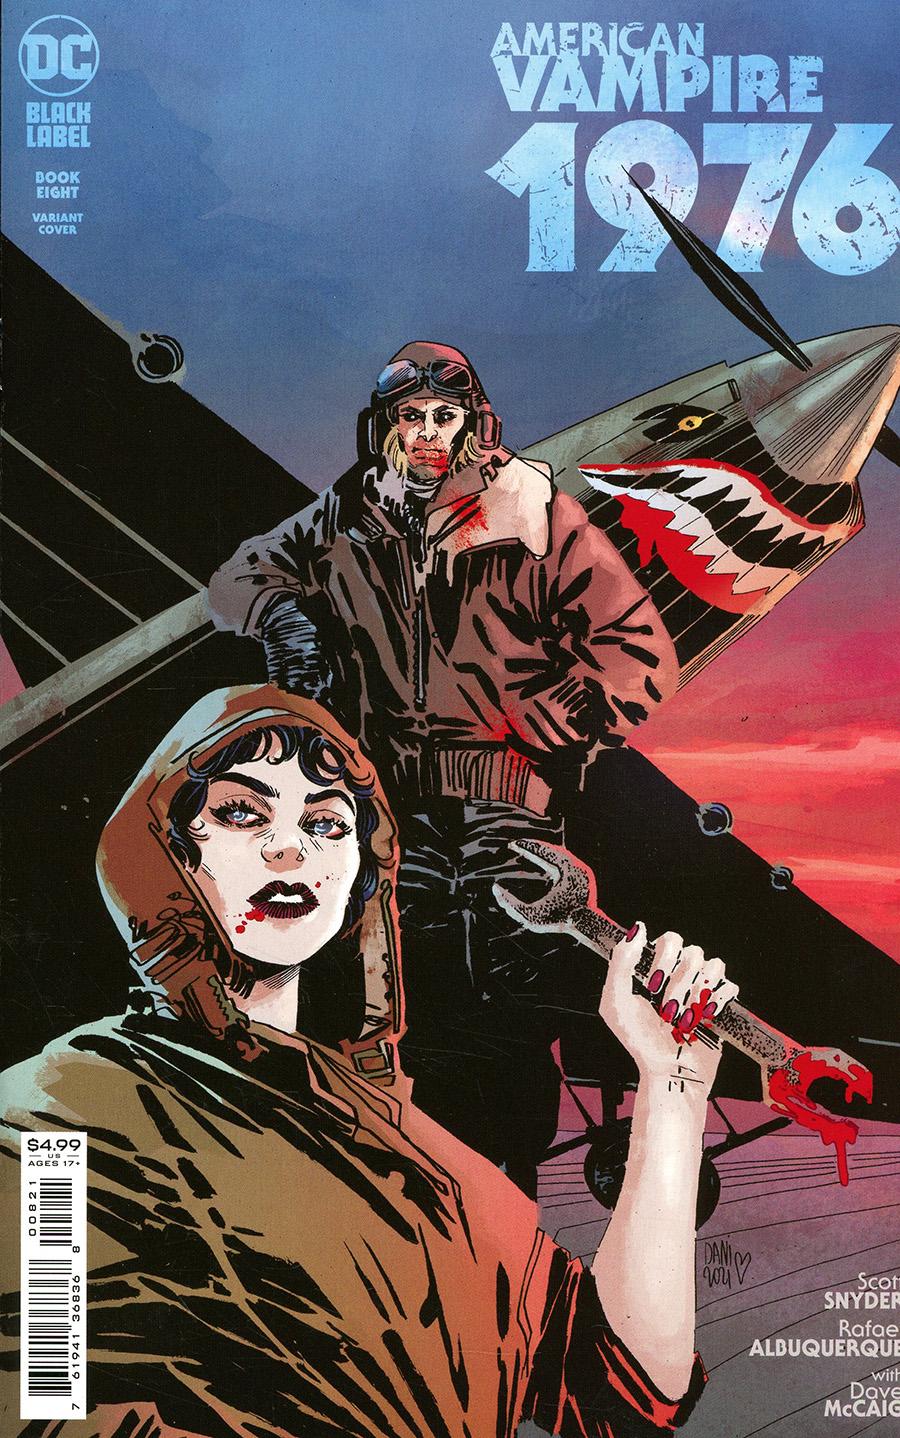 American Vampire 1976 #8 Cover B Variant Dani Card Stock Cover